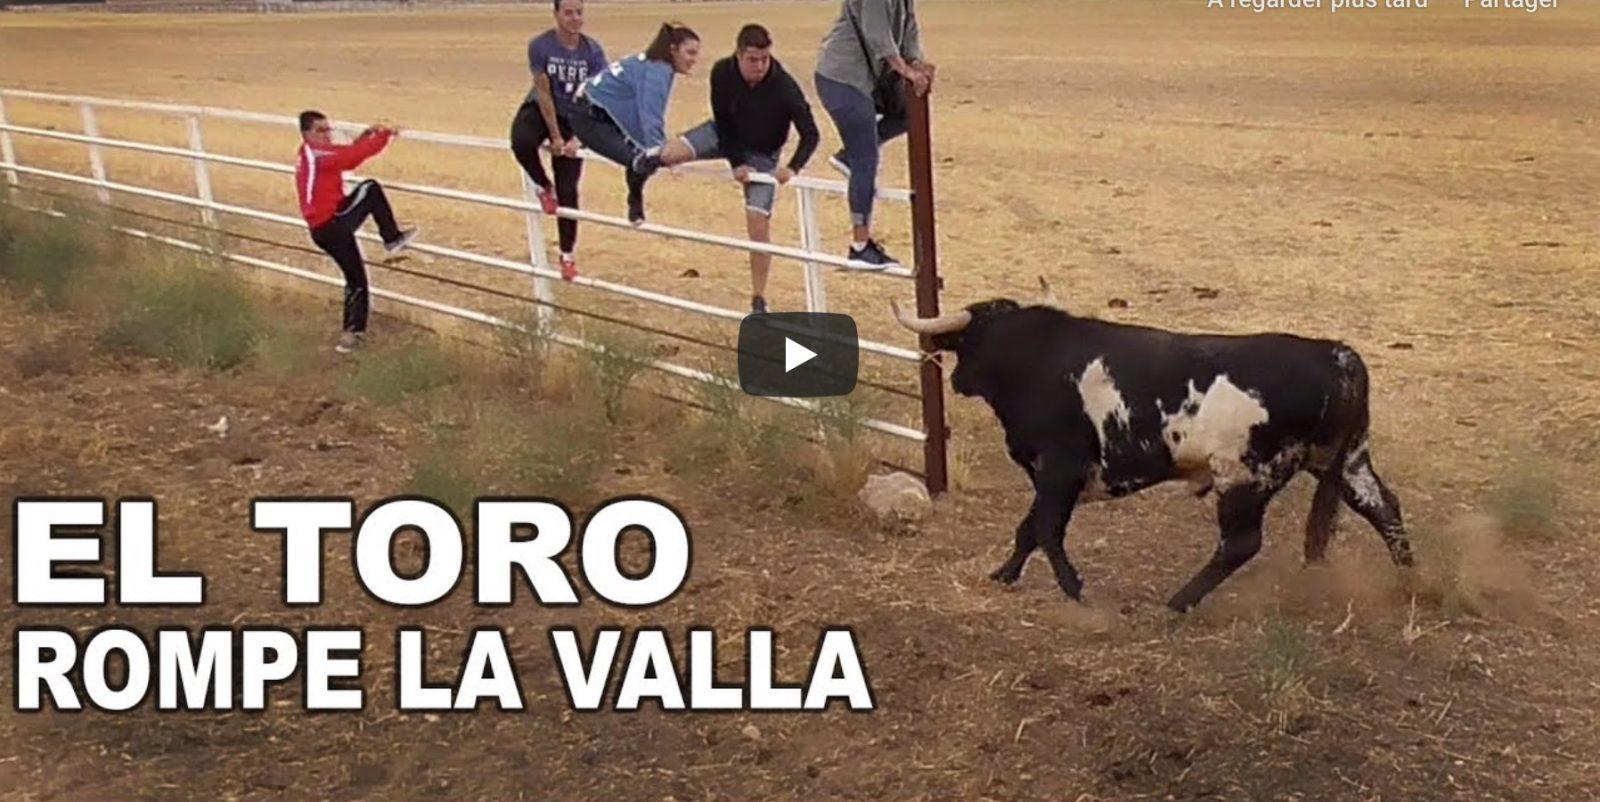 VIDEO DU NET // El Toro Rompe la Valla Castrillo de la Guareña 2019